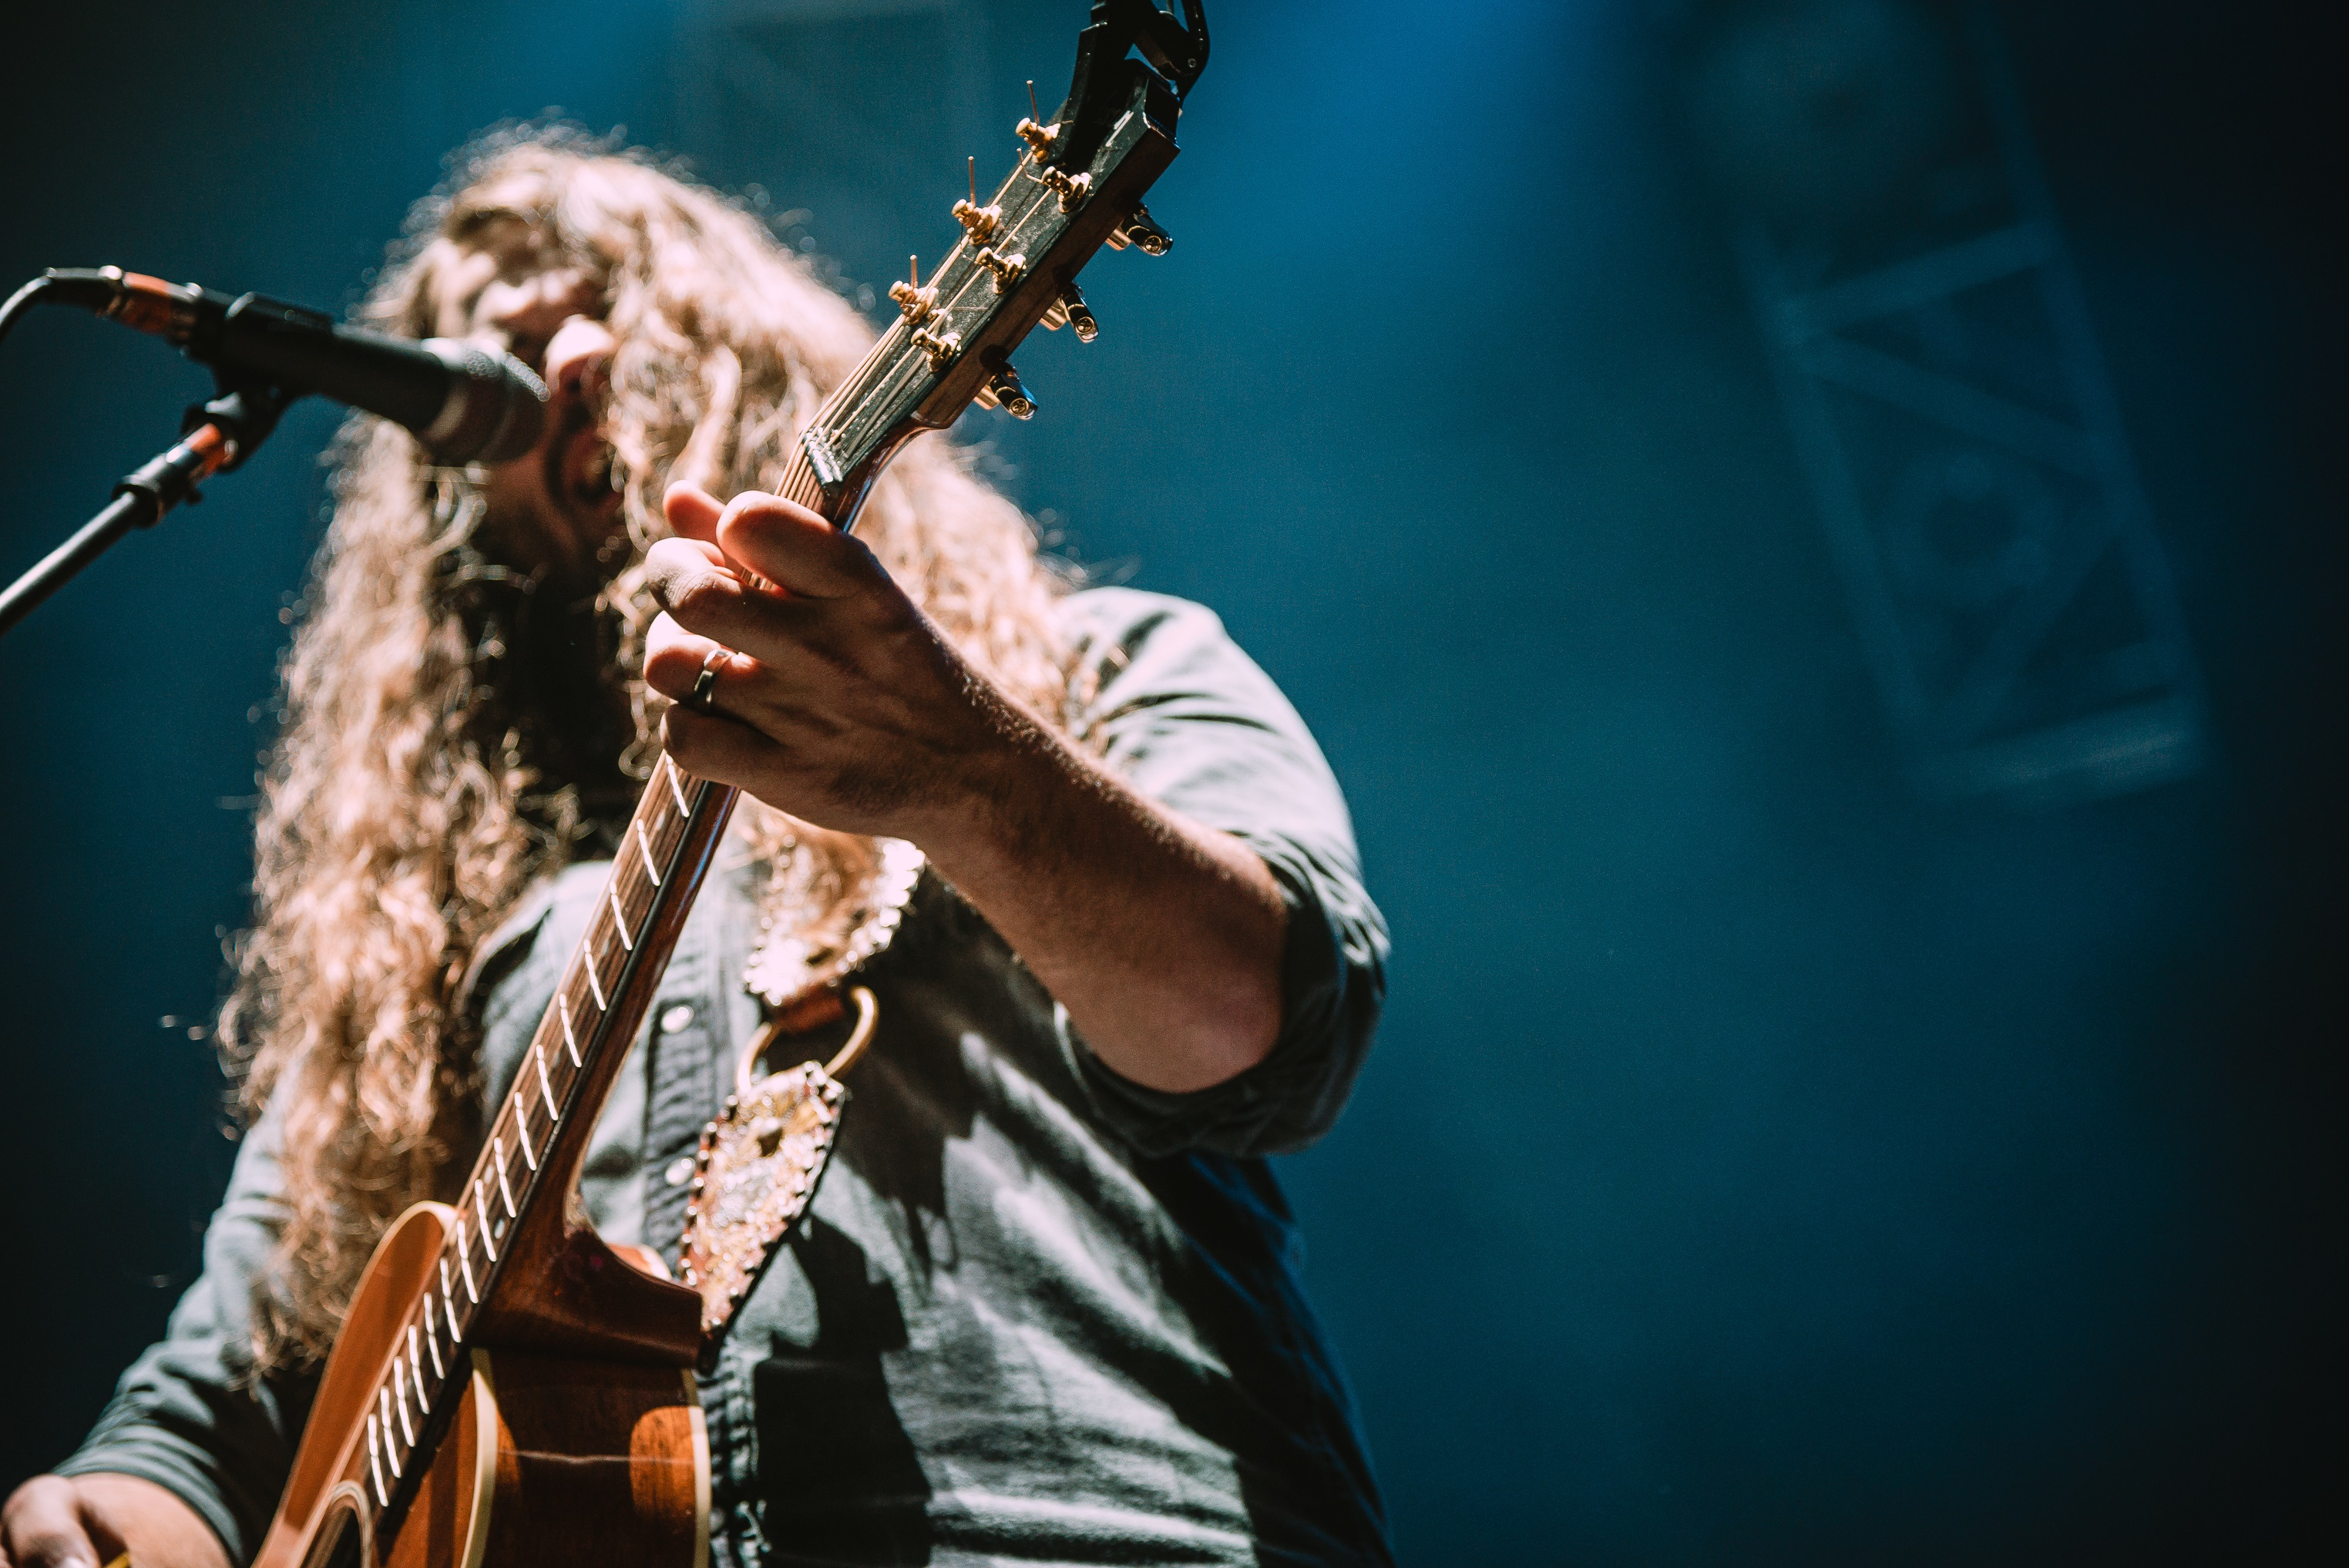 Brett Cobb; Photo credit: Andrew Wendowski/Sounds Like Nashville